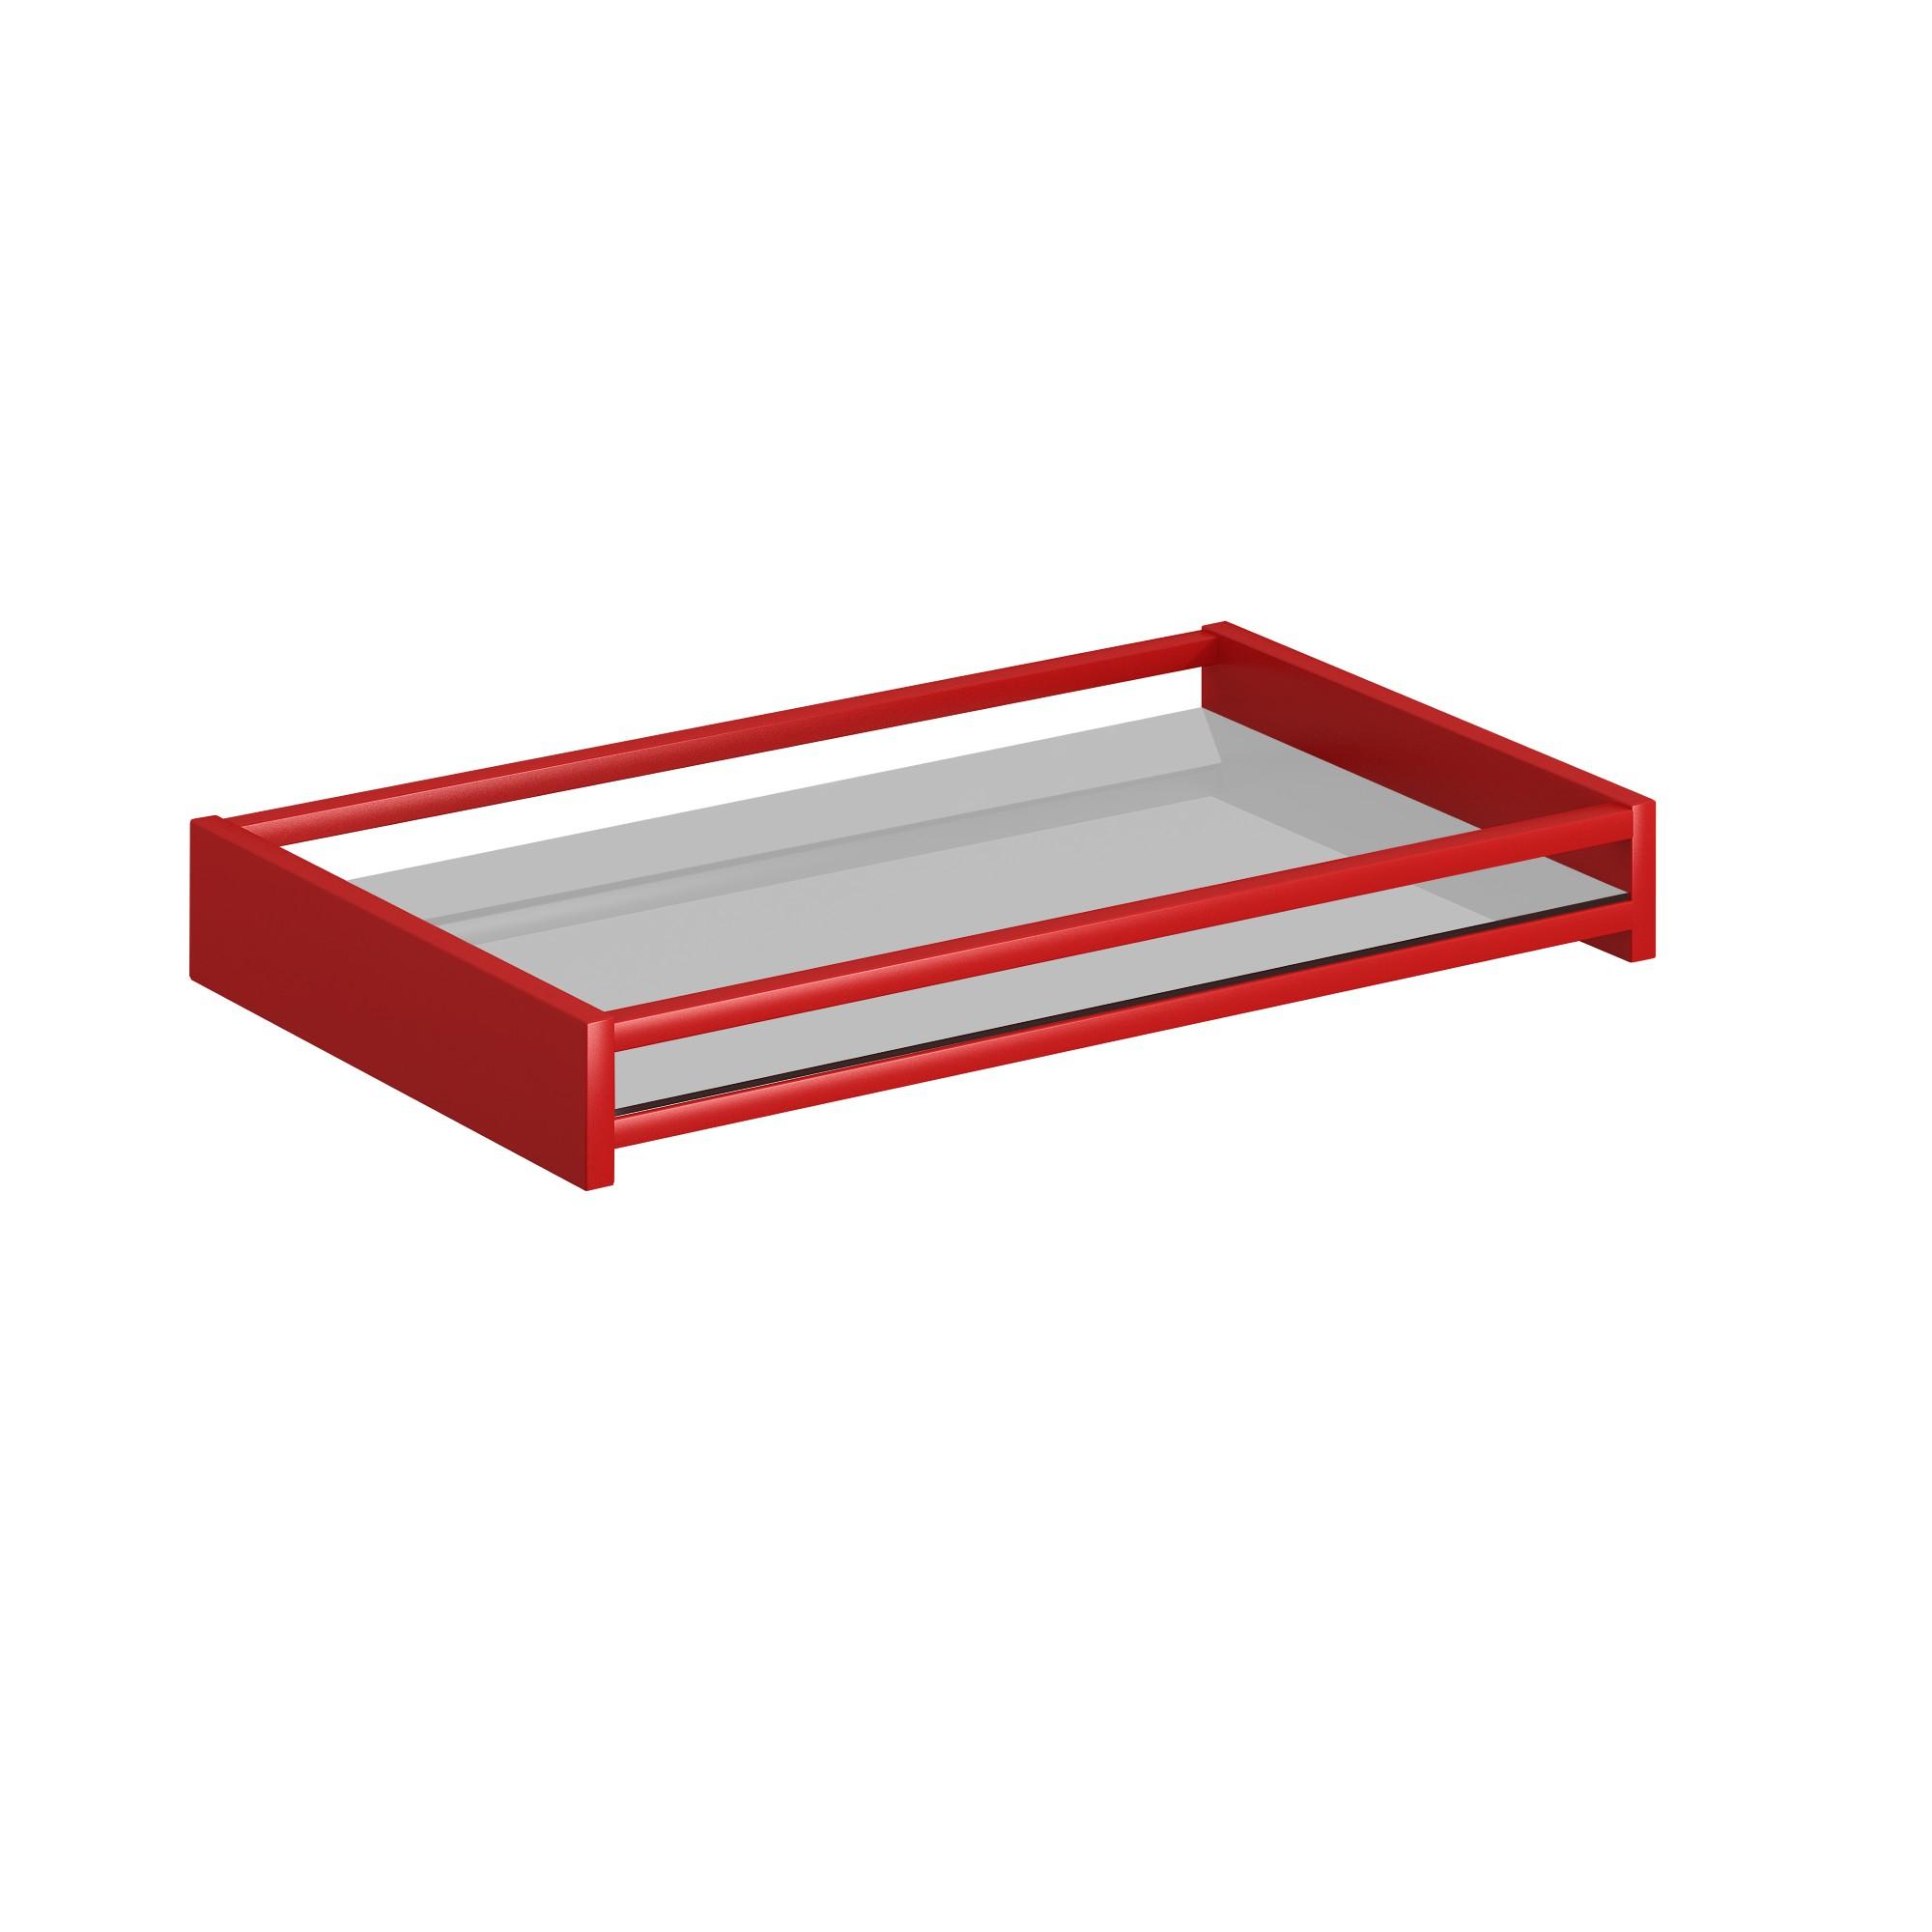 Bandeja Retangular 49x26cm Vermelha Elegance - Helo Moveis